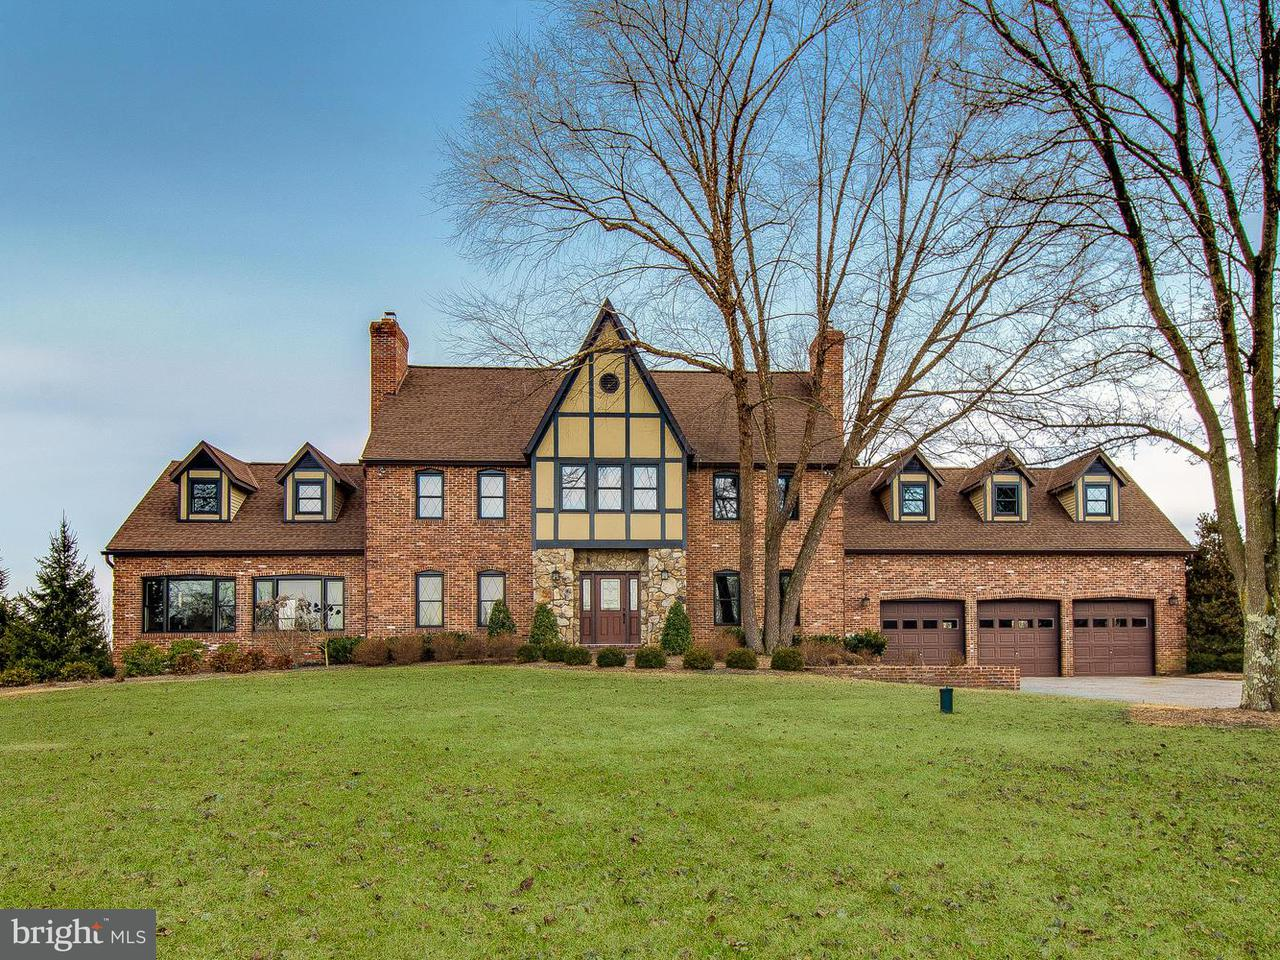 Casa Unifamiliar por un Venta en 19716 Golden Valley Lane 19716 Golden Valley Lane Brookeville, Maryland 20833 Estados Unidos